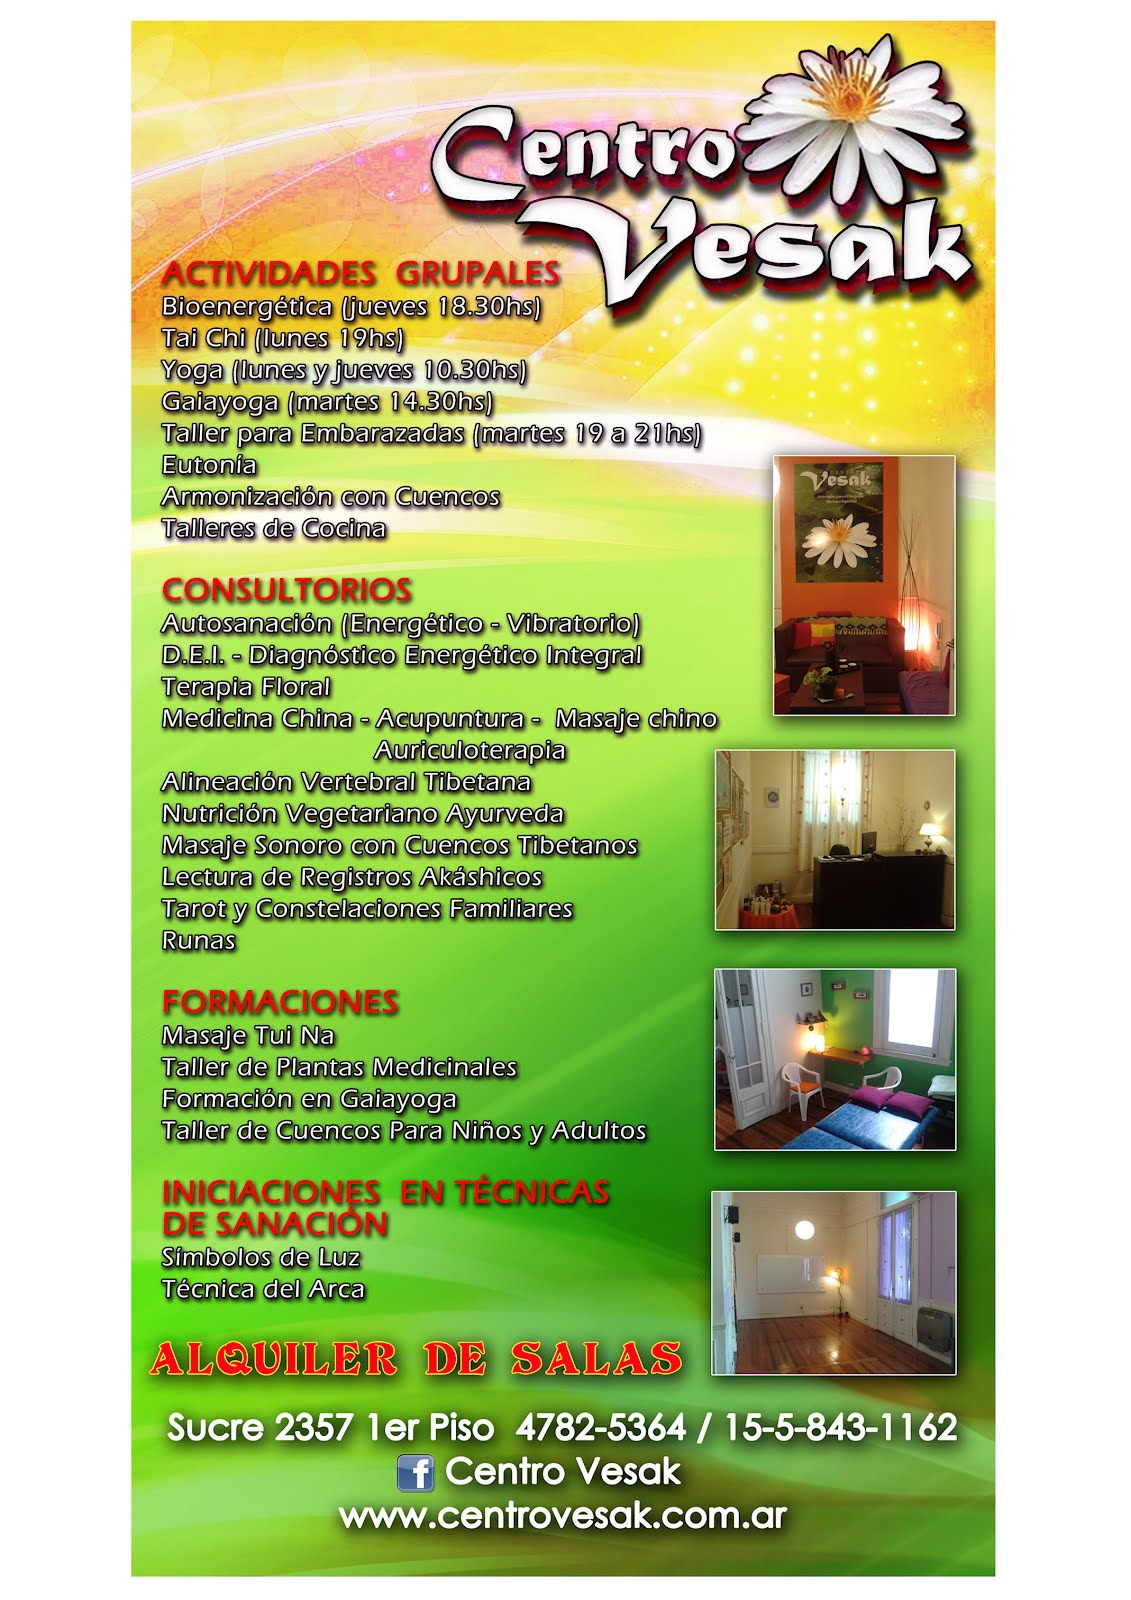 Centro Vesak: ACTIVIDADES